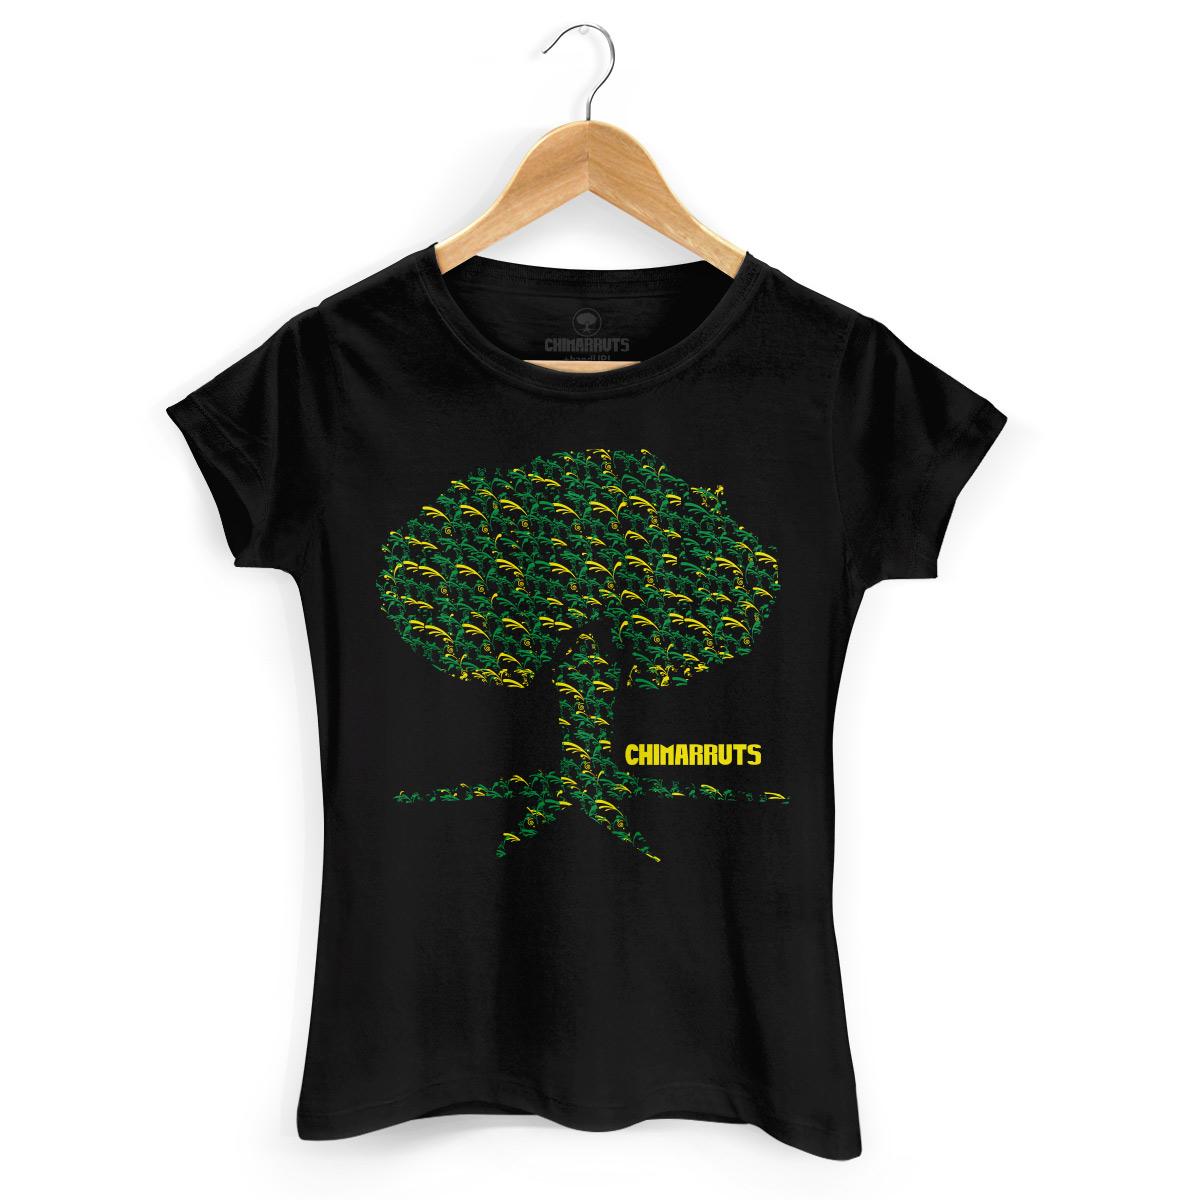 Camiseta Feminina Chimarruts Full Hill Modelo 1